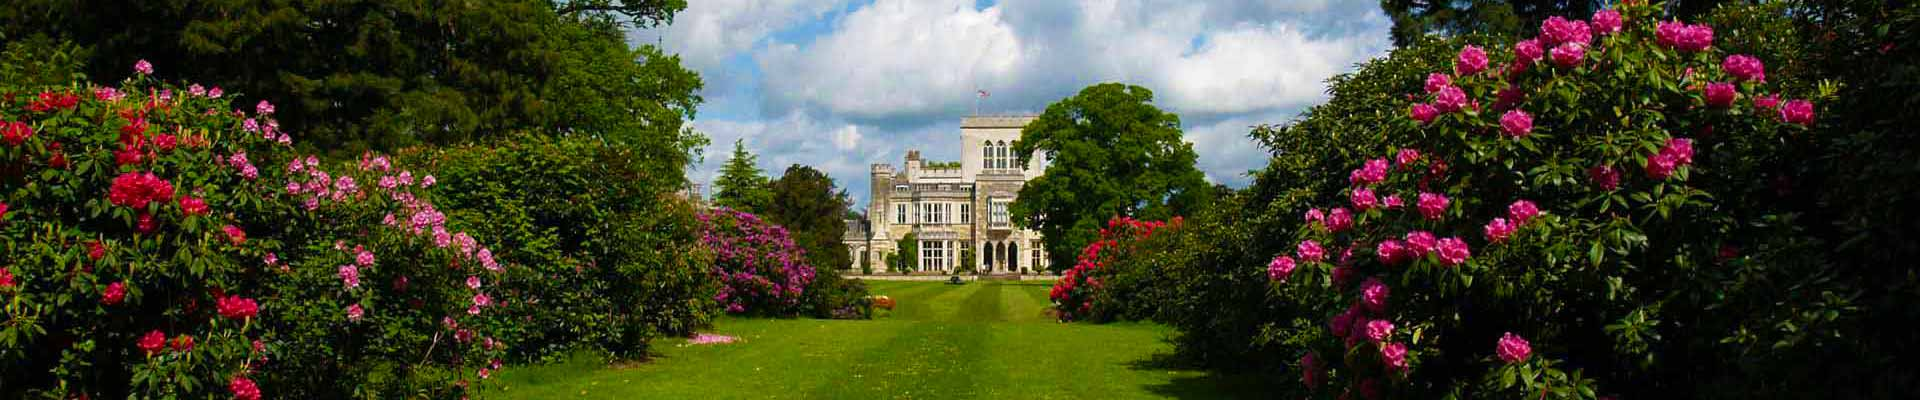 Photo of the gardens at Ashridge House